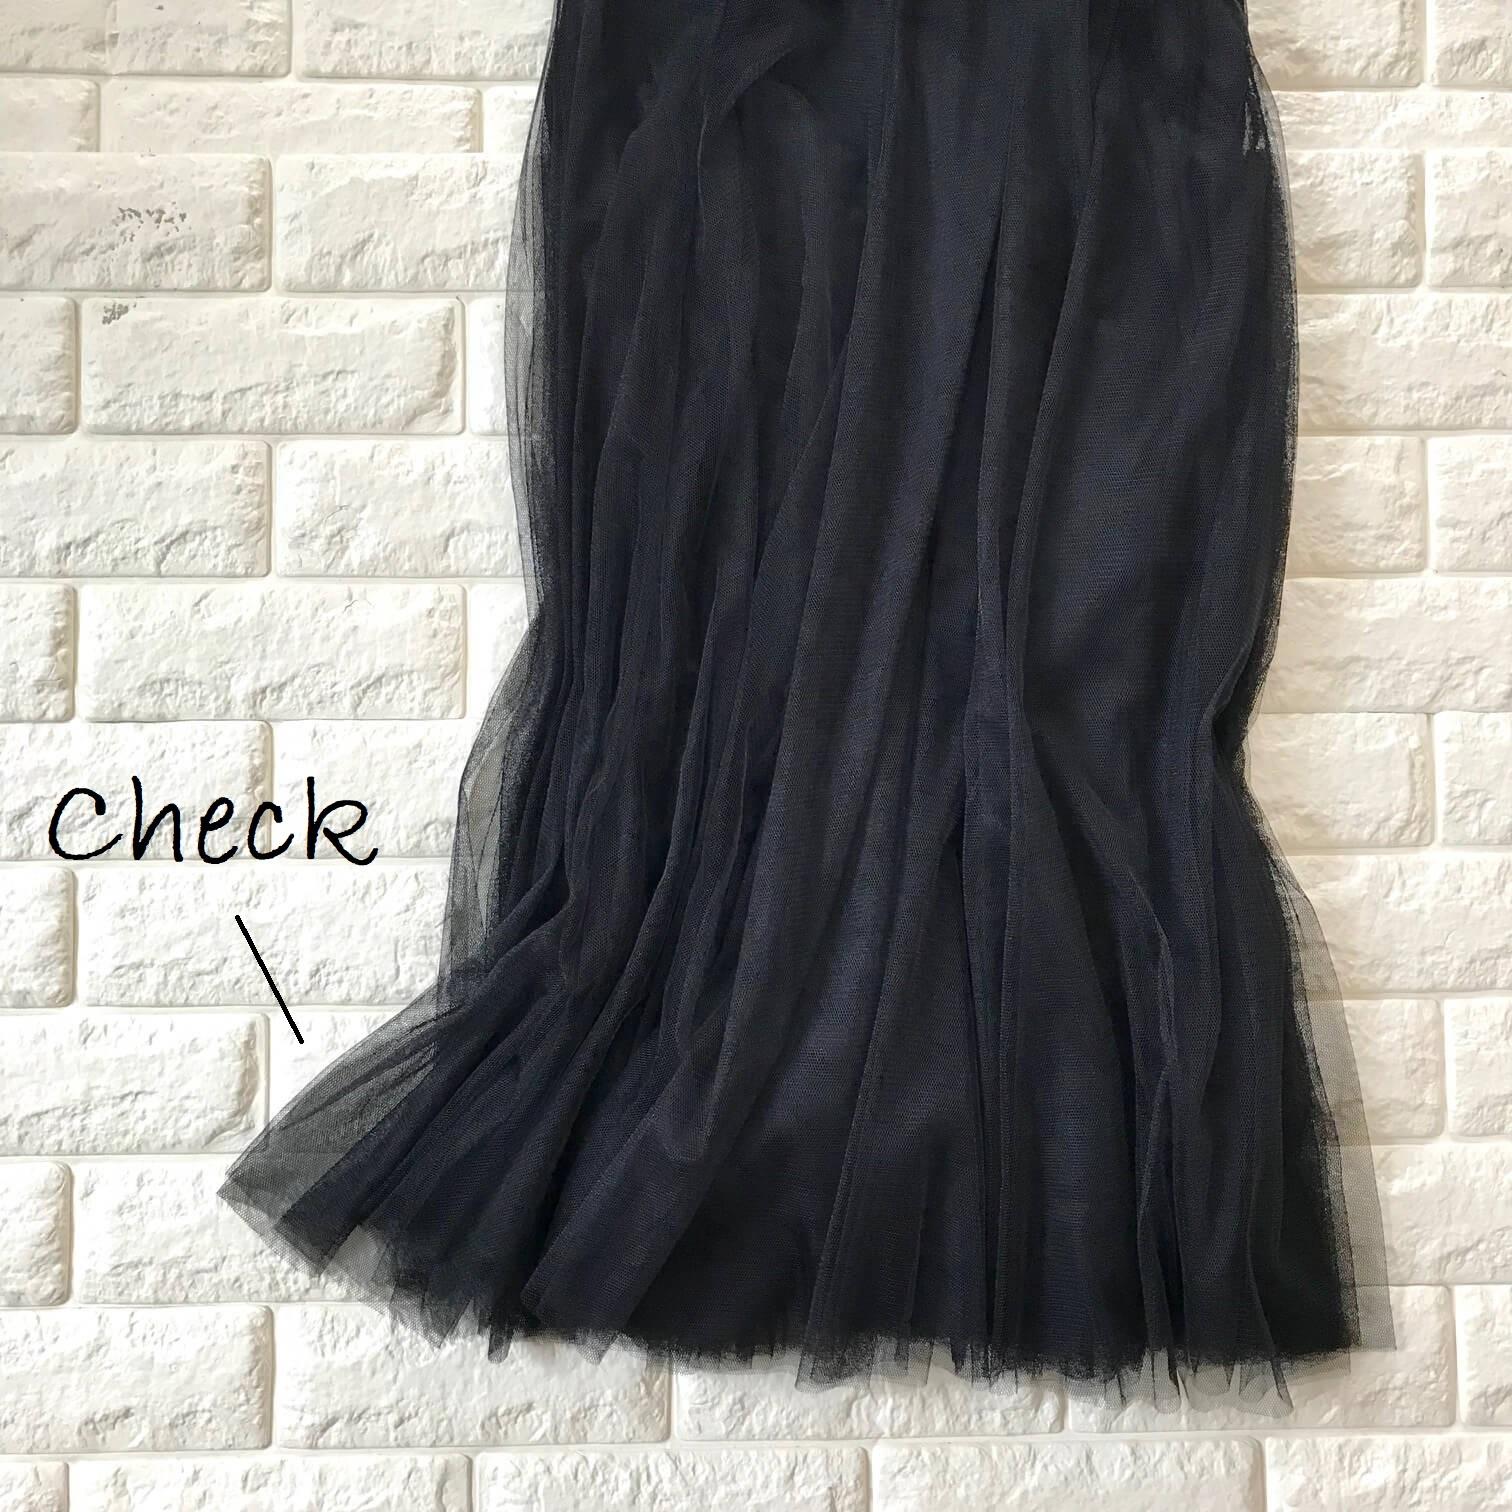 tiptopのチュールスカート、裾部分アップ画像